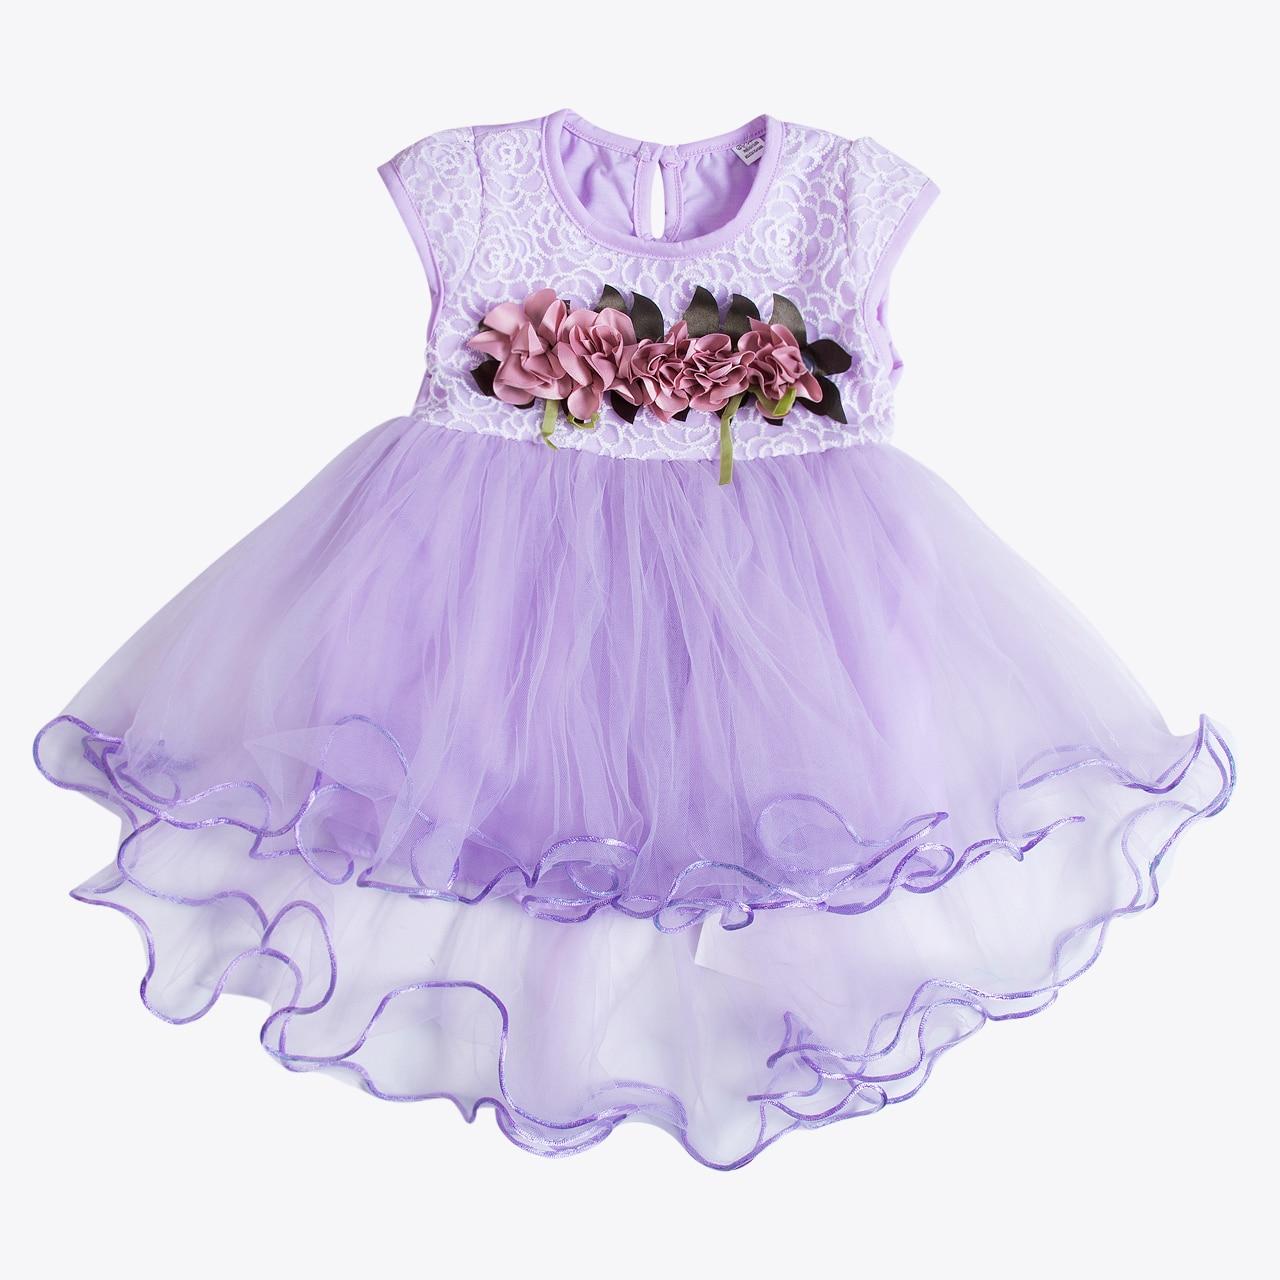 Gift Toddler Infant Kids Baby Girls Summer Sweet Cute Floral Dress ...